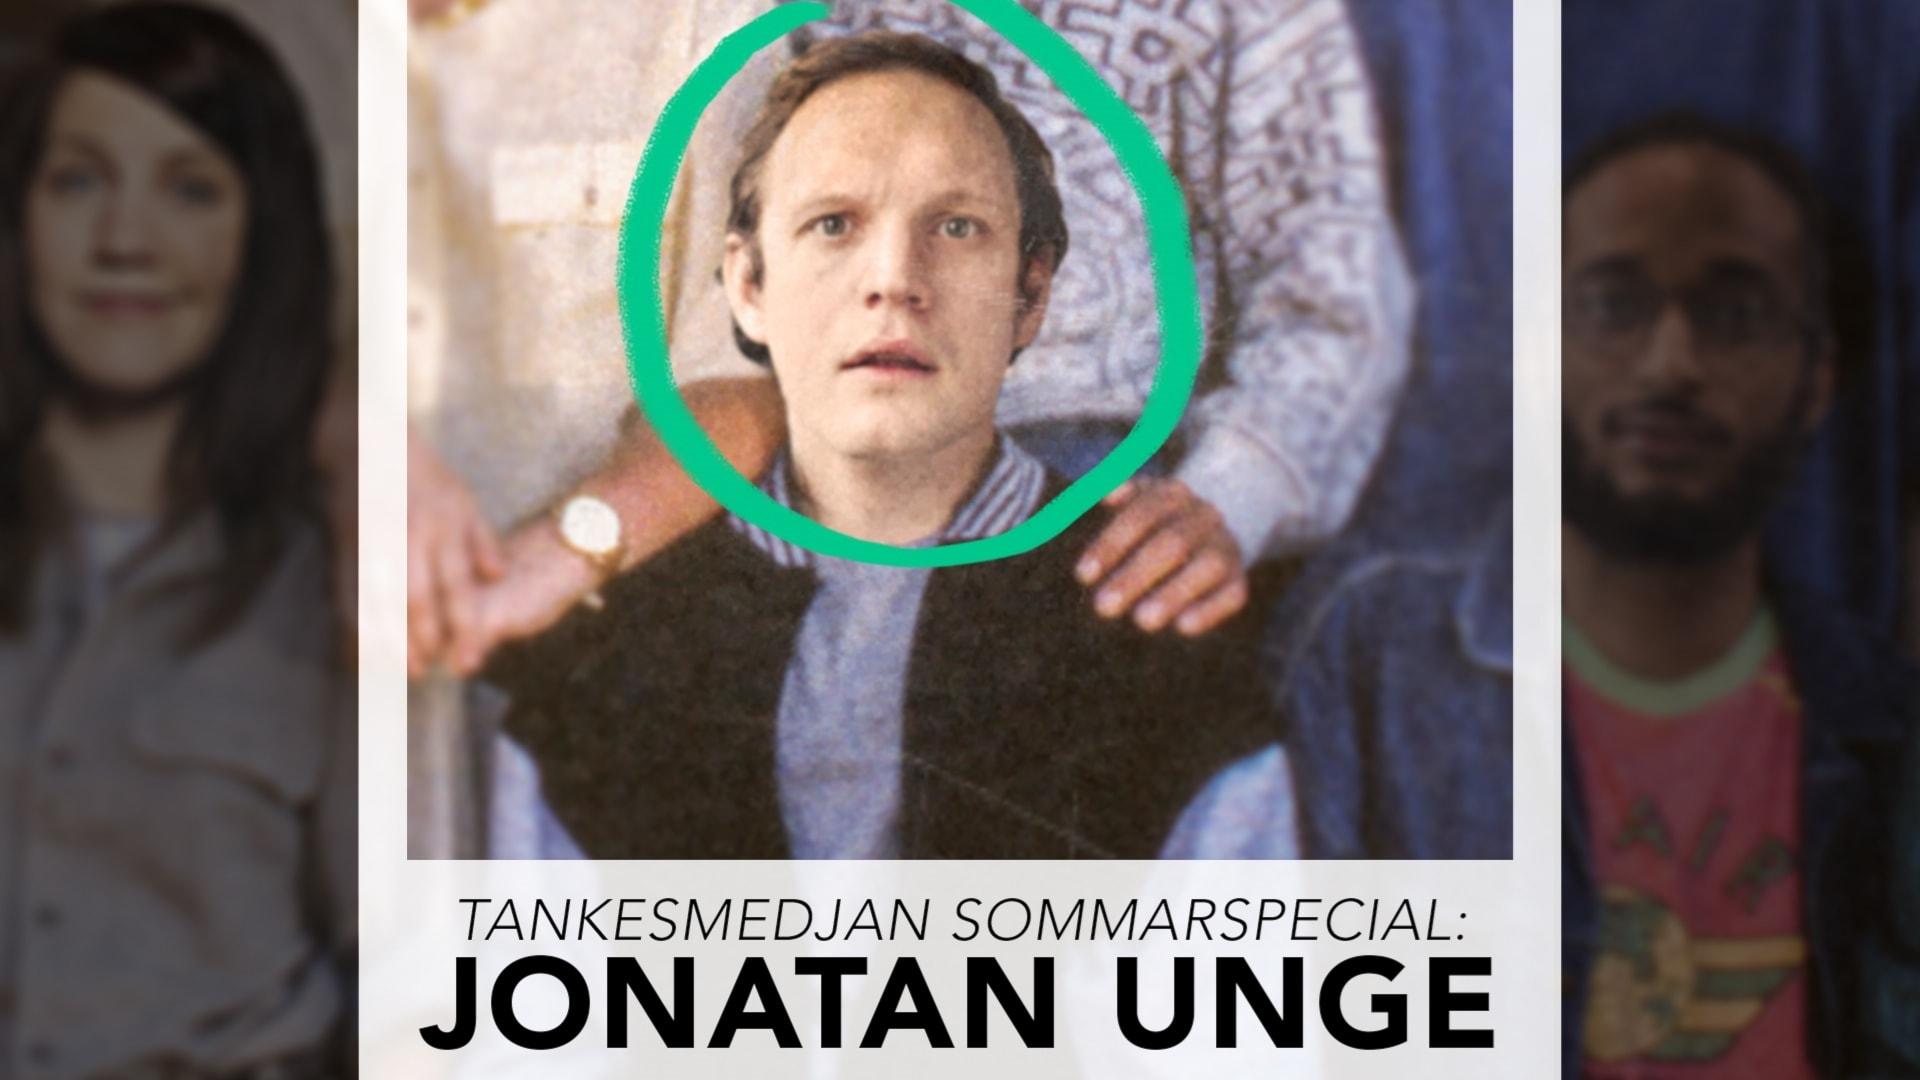 Tankesmedjan sommarspecial: Jonatan Unge!